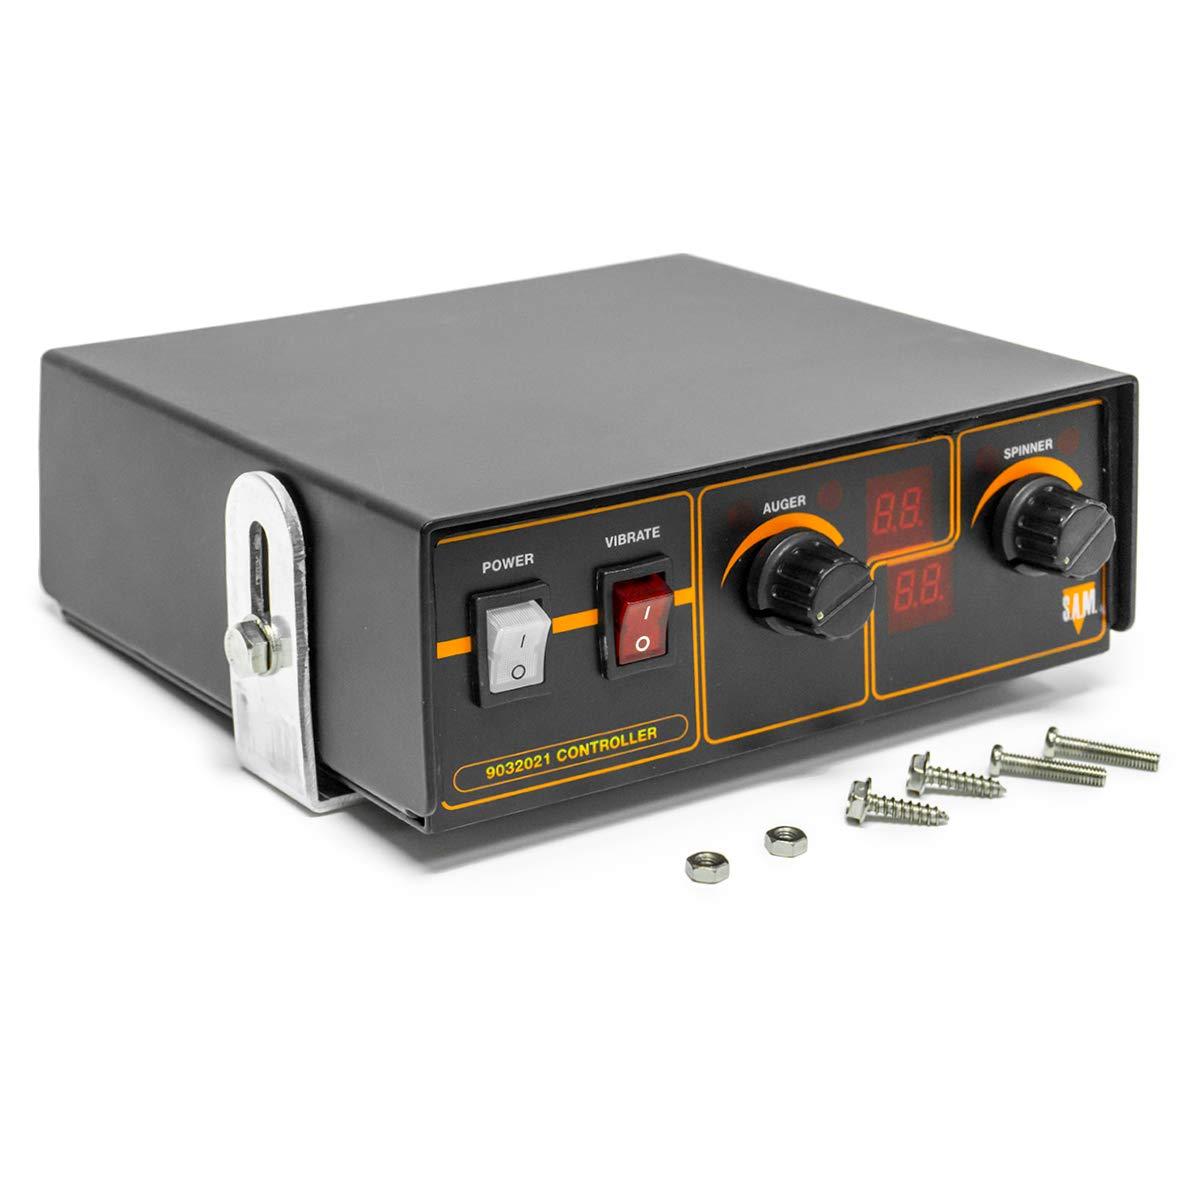 Spreader Controller Box for SnowEx D5525 D6527 Buyers SAM 9032021